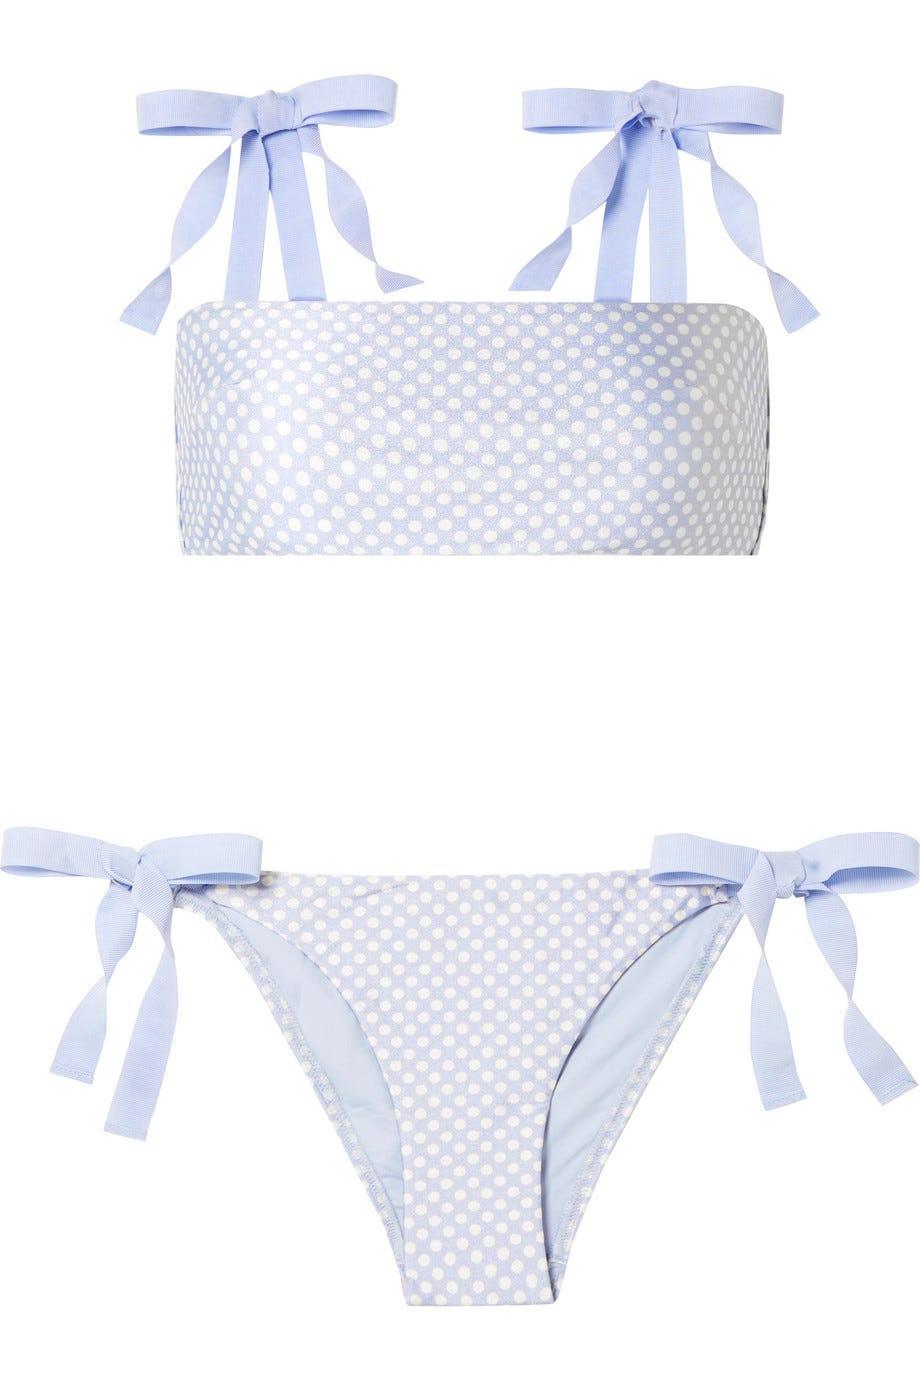 f7cd5e8770 New Swimsuit Trends 2019 Cool Bikini